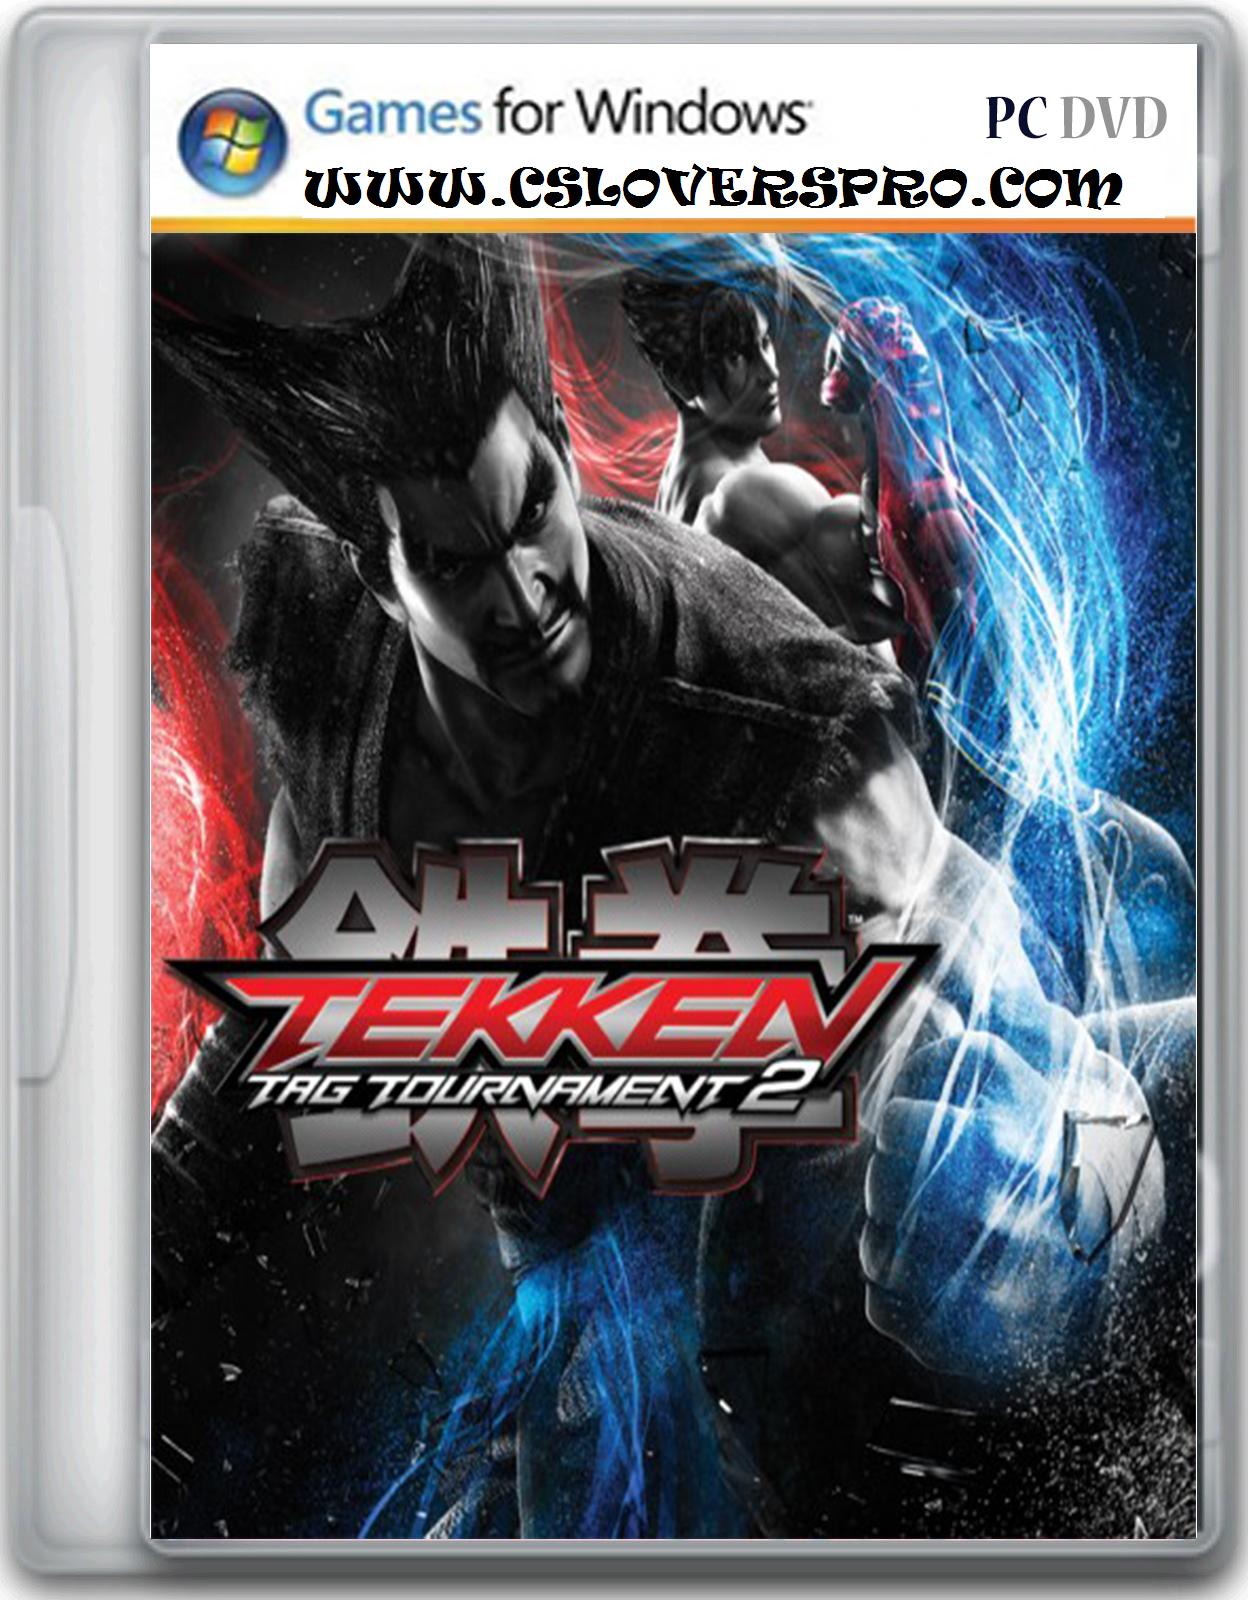 Tekken tag tournament free download pc games youtube.